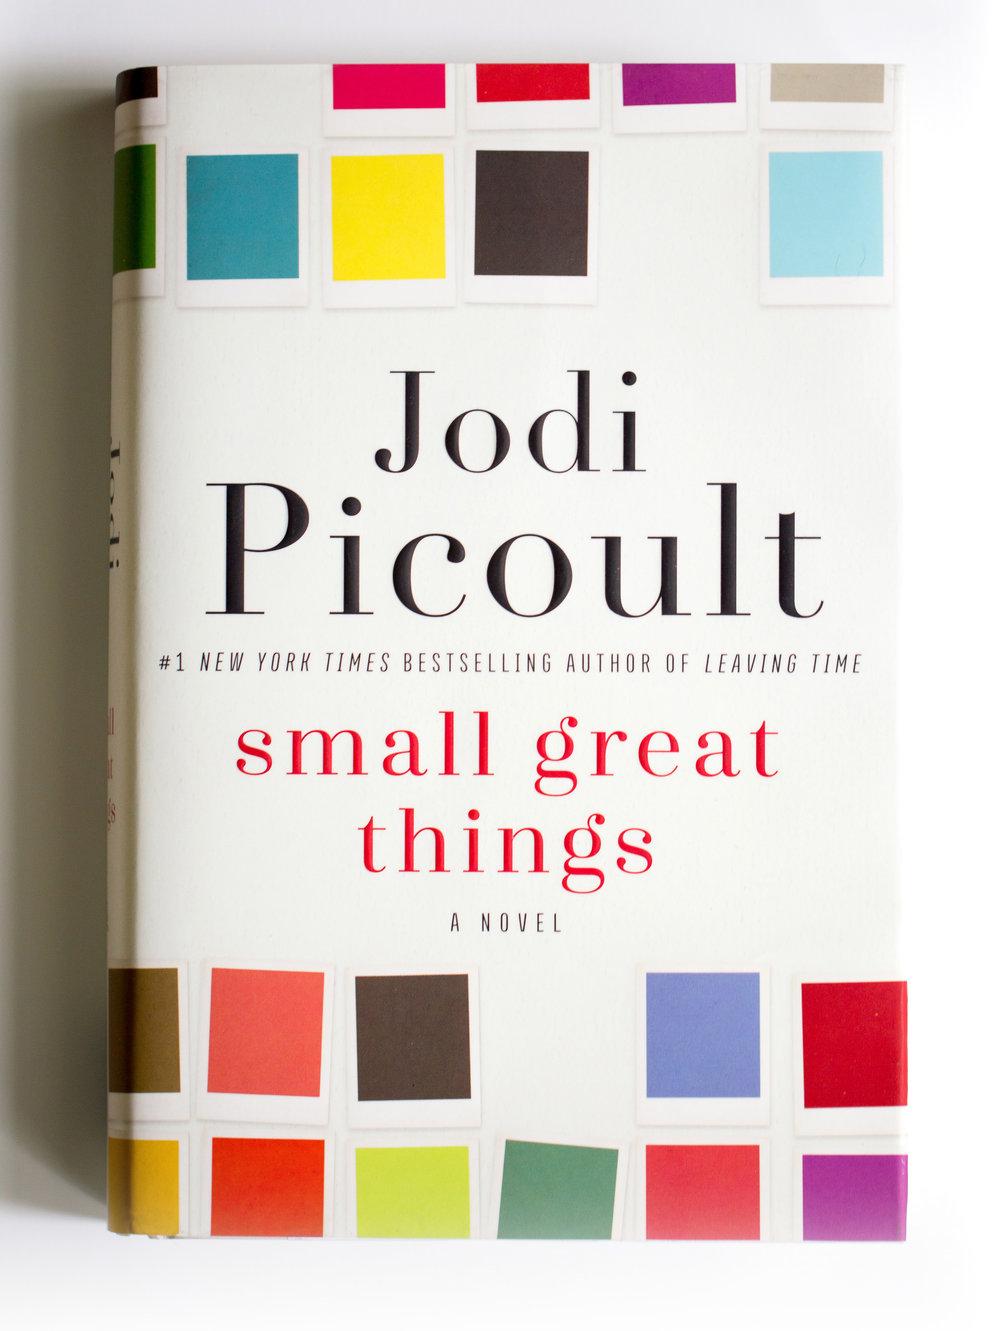 Jodi Picoult Small Great Things Marketing